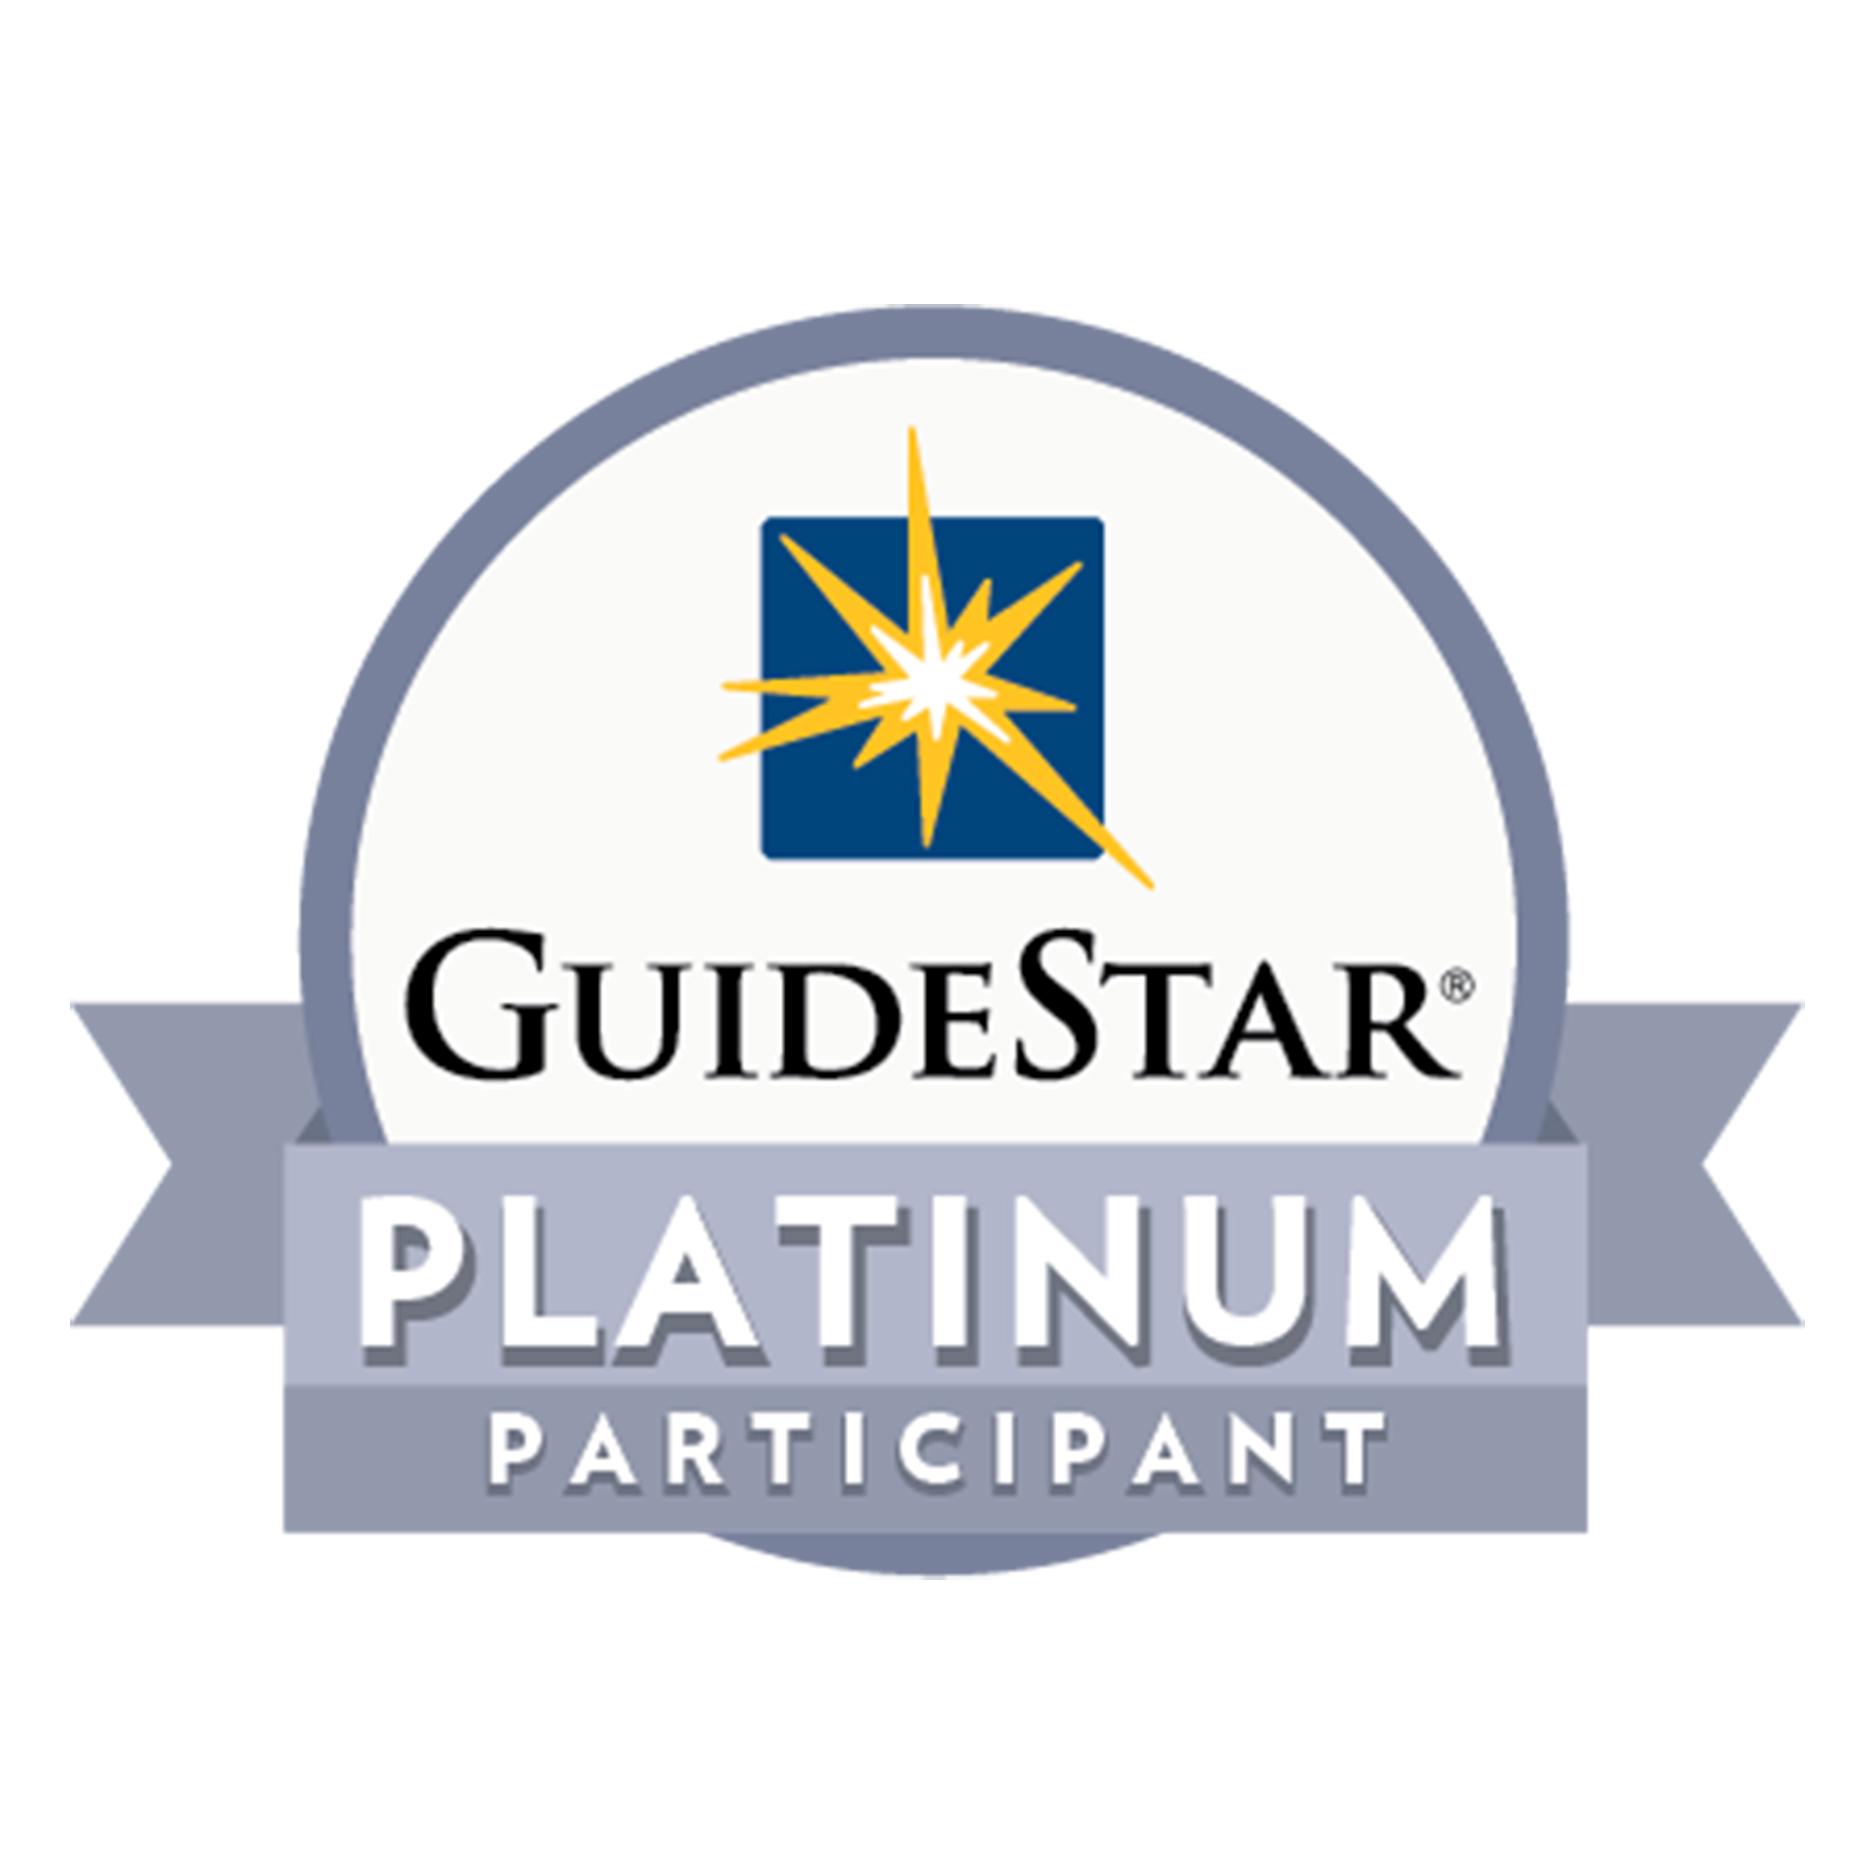 guidestar_platinum_seal_of_transparency color..jpg